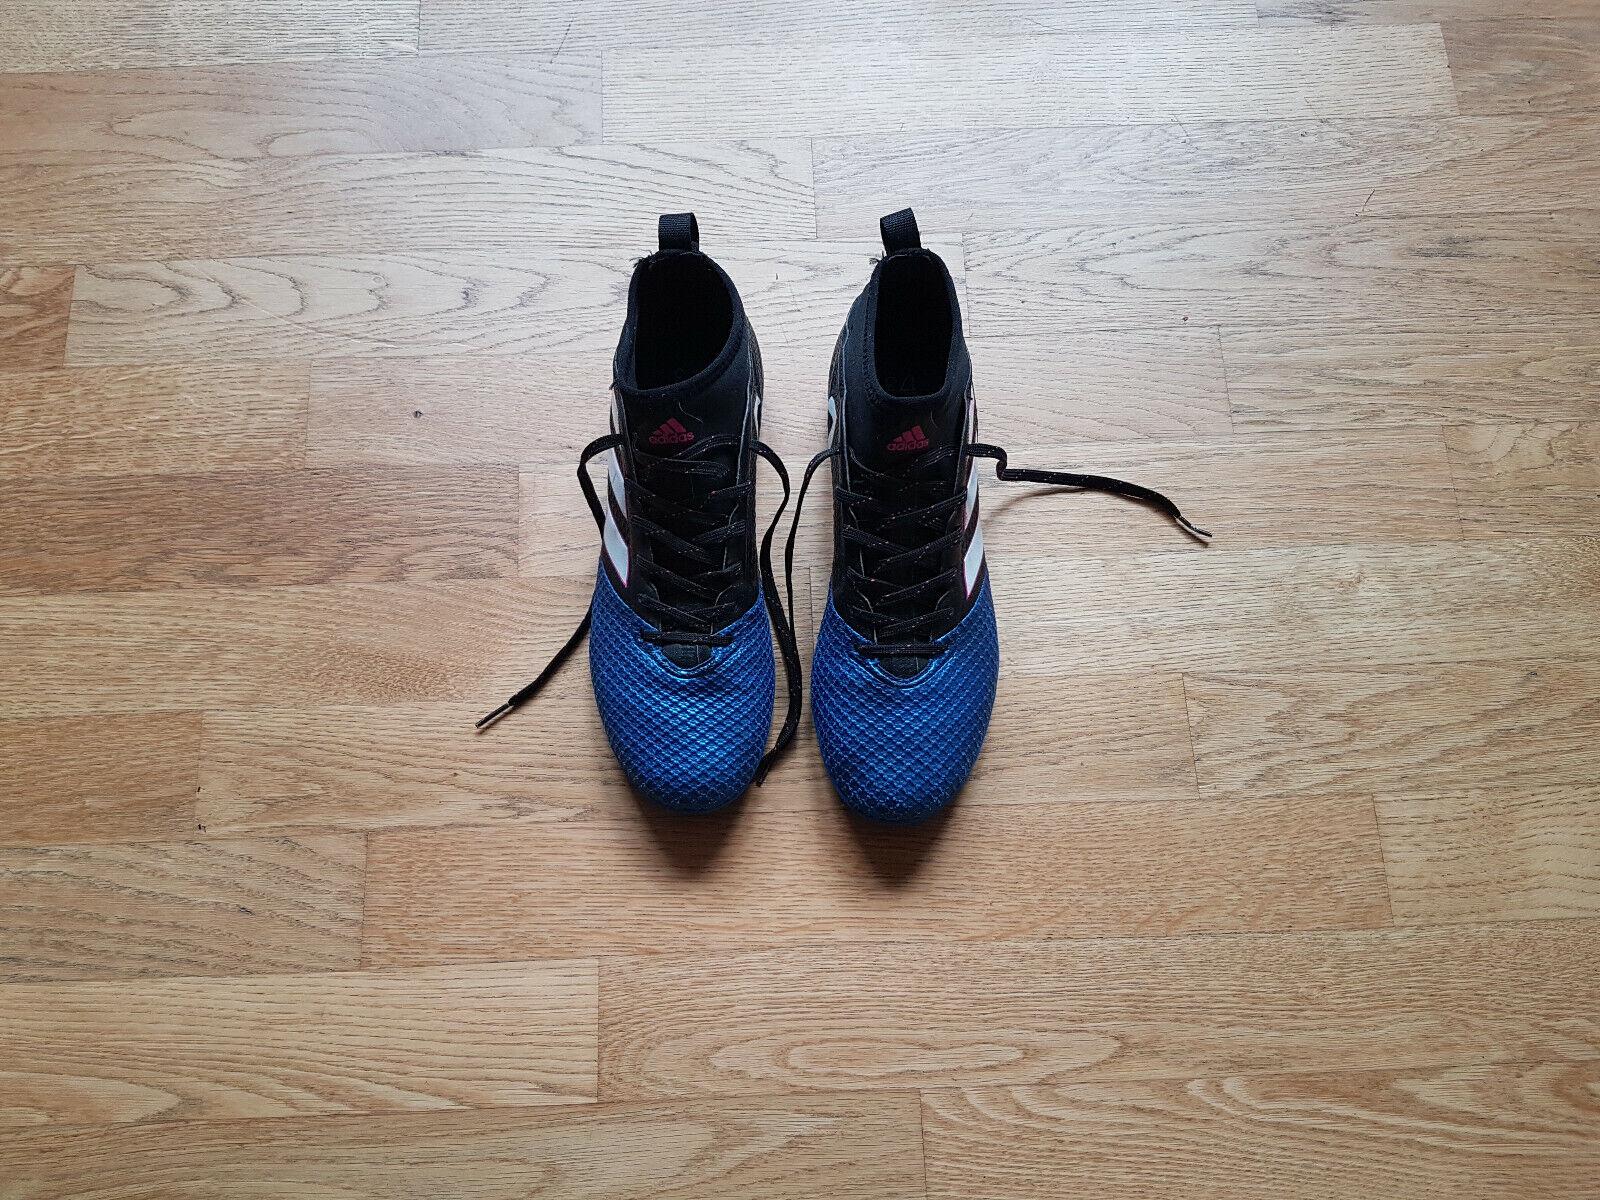 Sportschuhe Adidas-Ace-17.3-Primemesh, Gr.42, Top